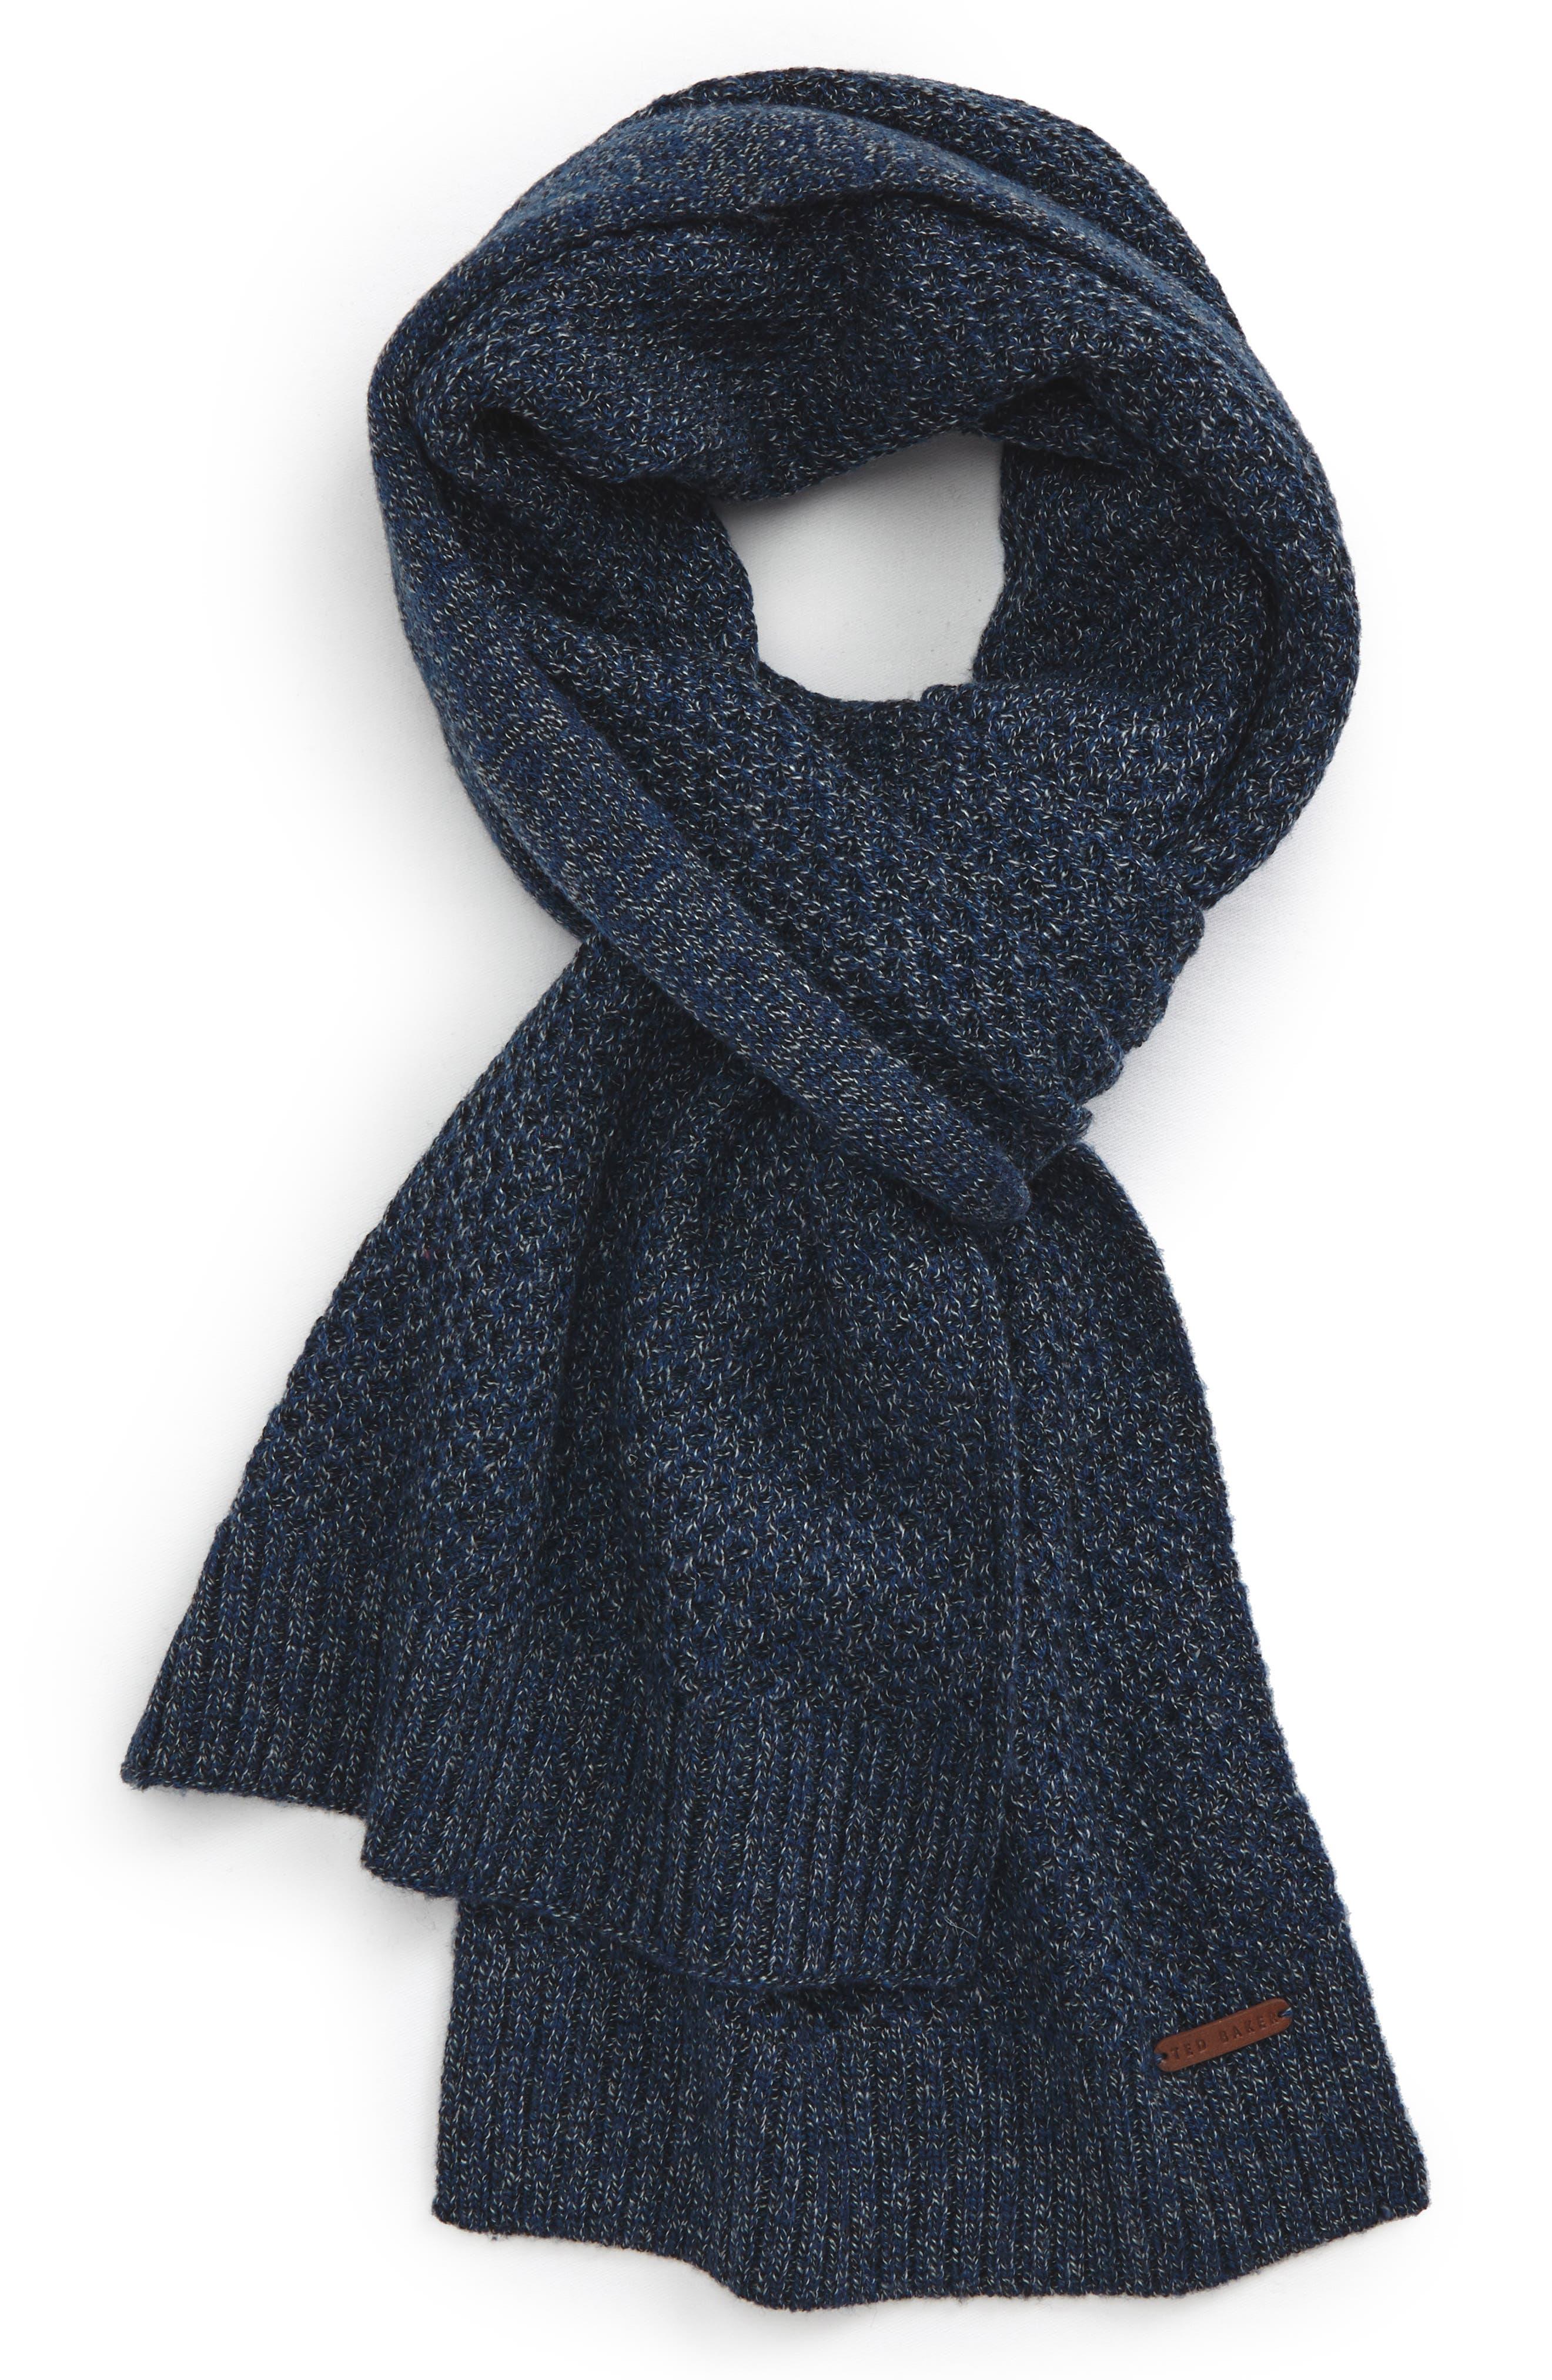 Kapok Wool Blend Scarf,                         Main,                         color, Teal-Blue